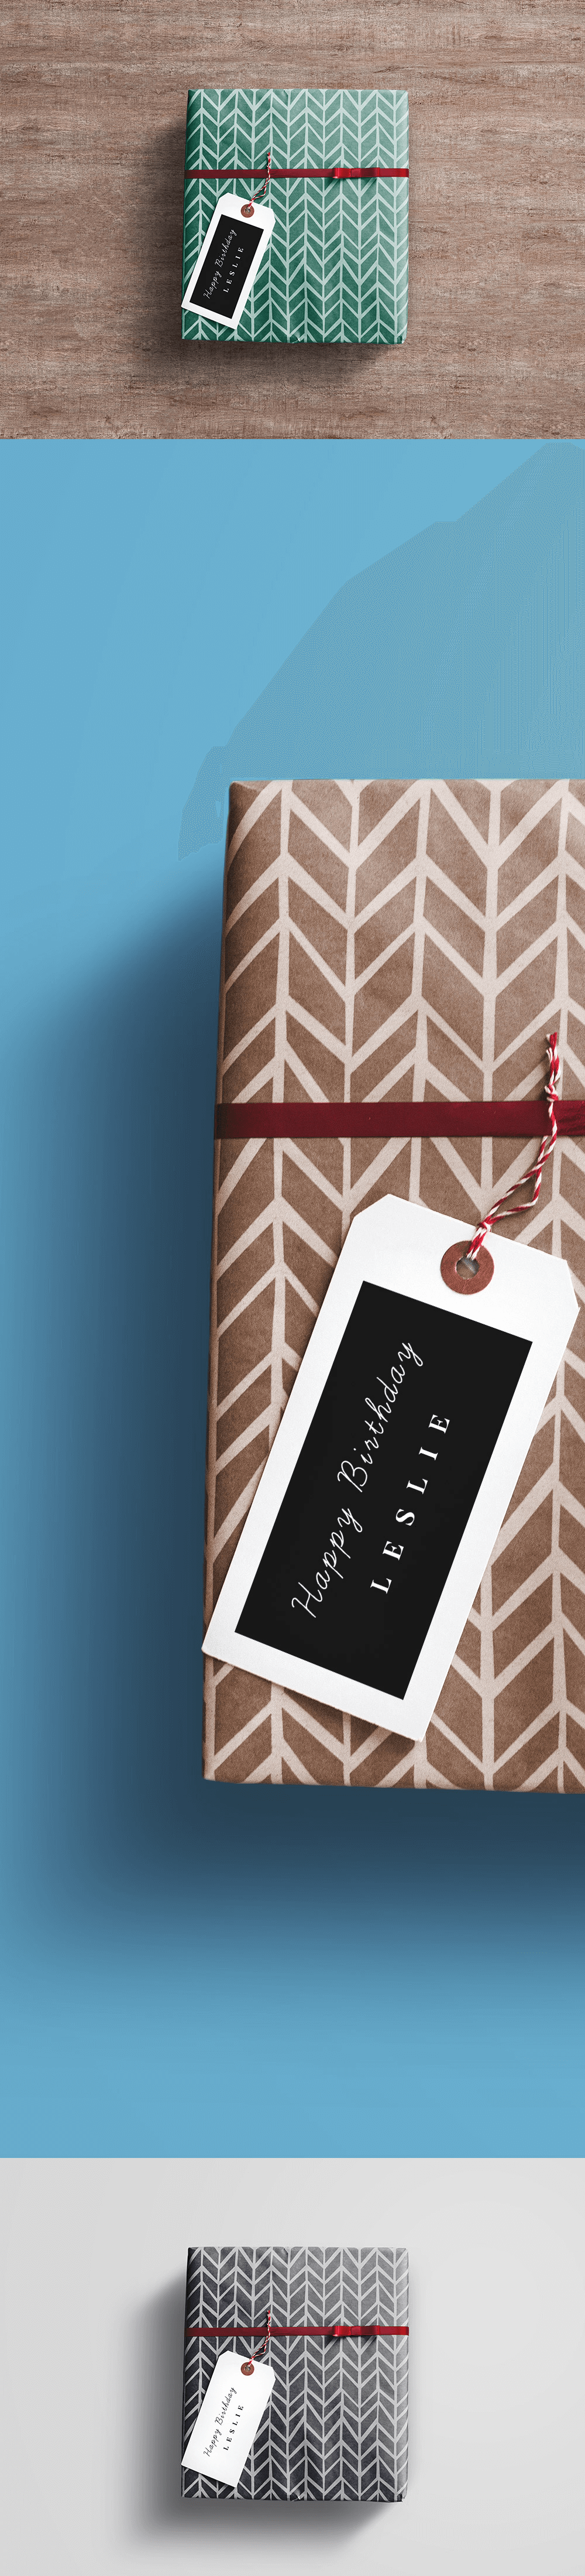 Мокап подарочных коробок. gift box